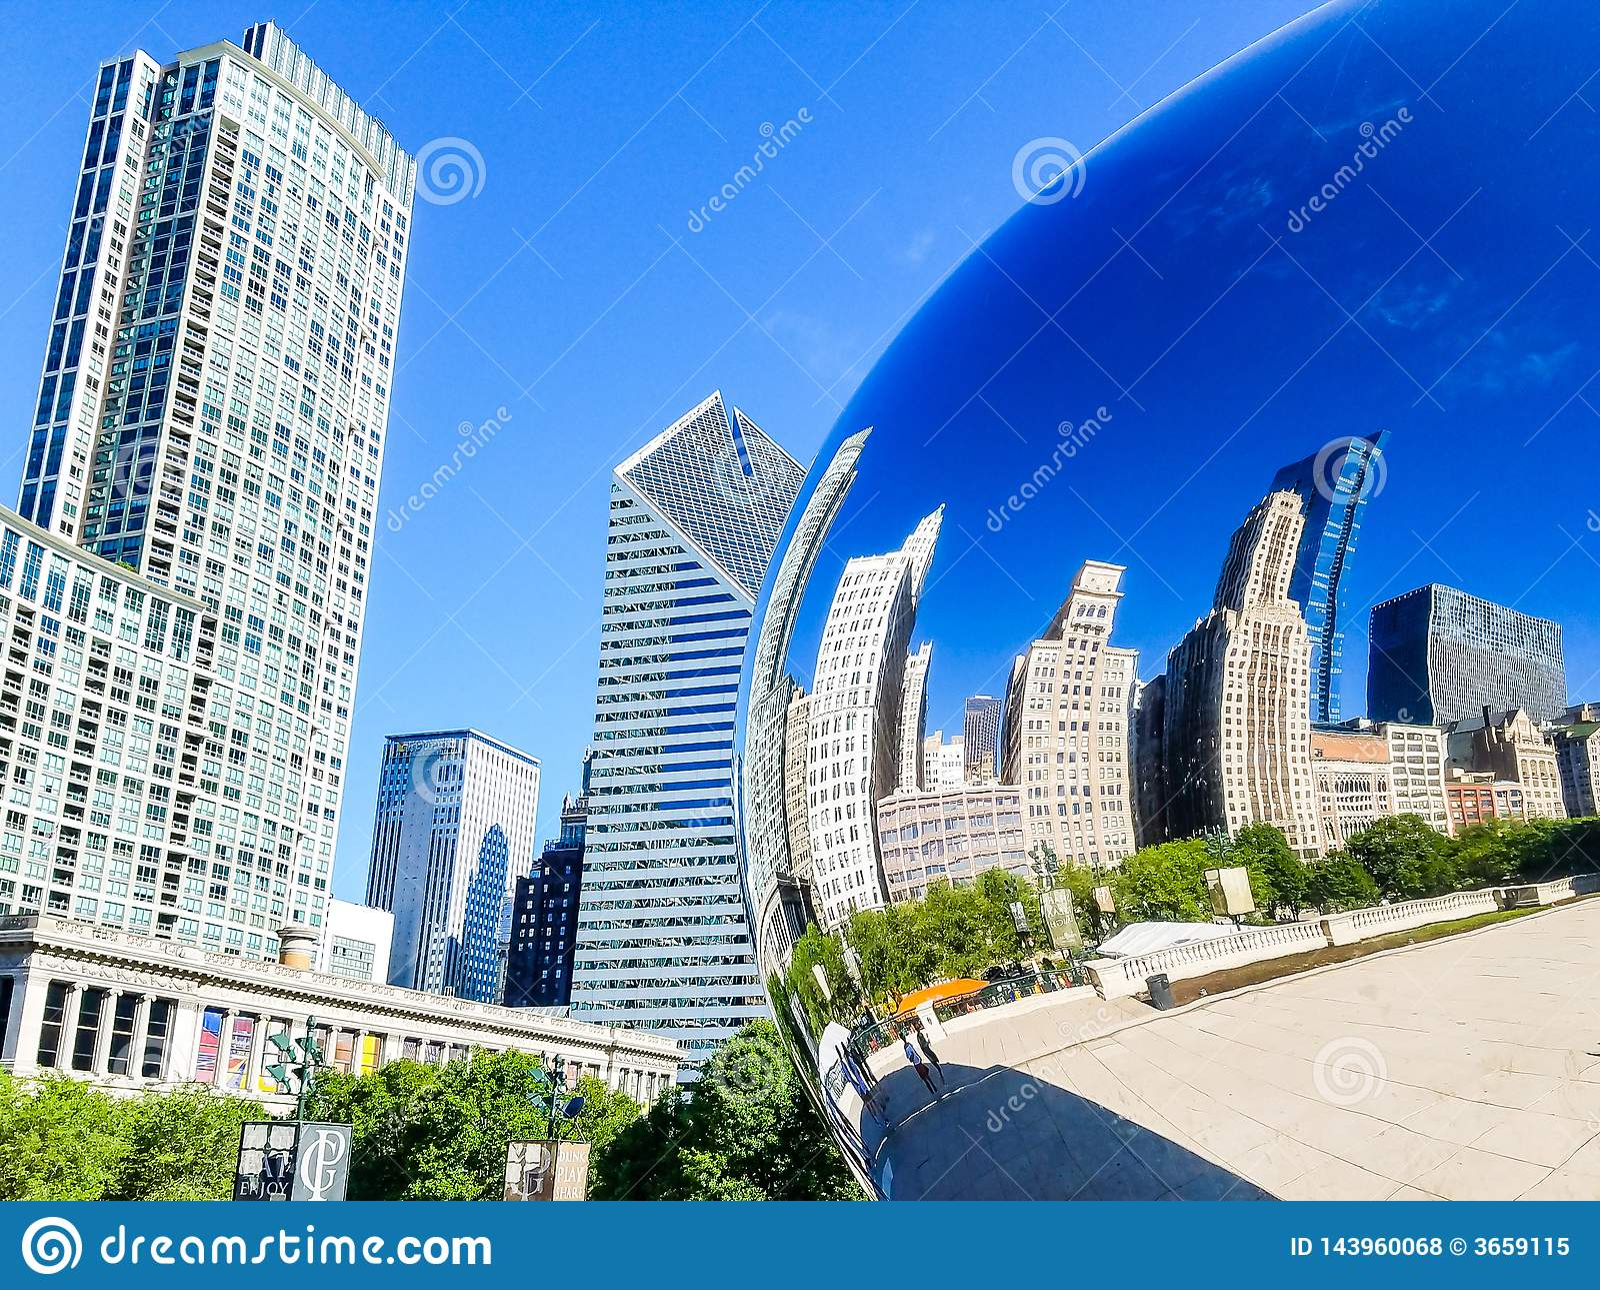 Chicago, Illinois, de V 07 07 2018 Bezinning van de gebouwen van Chicago in Chicago Bean Cloud Gate